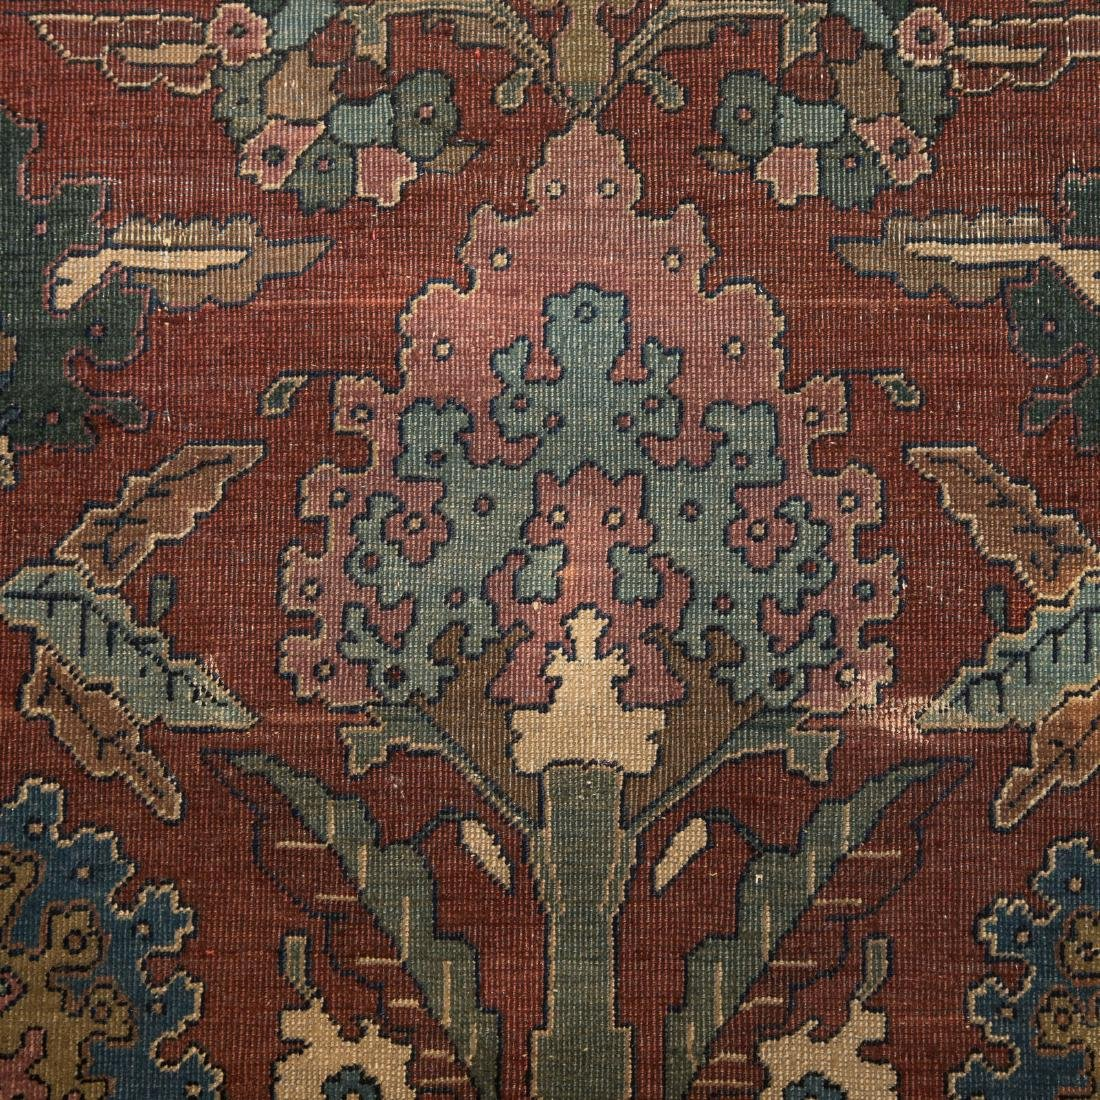 Antique Feraghan Sarouk rug, approx. 4.5 x 6.8 - 4